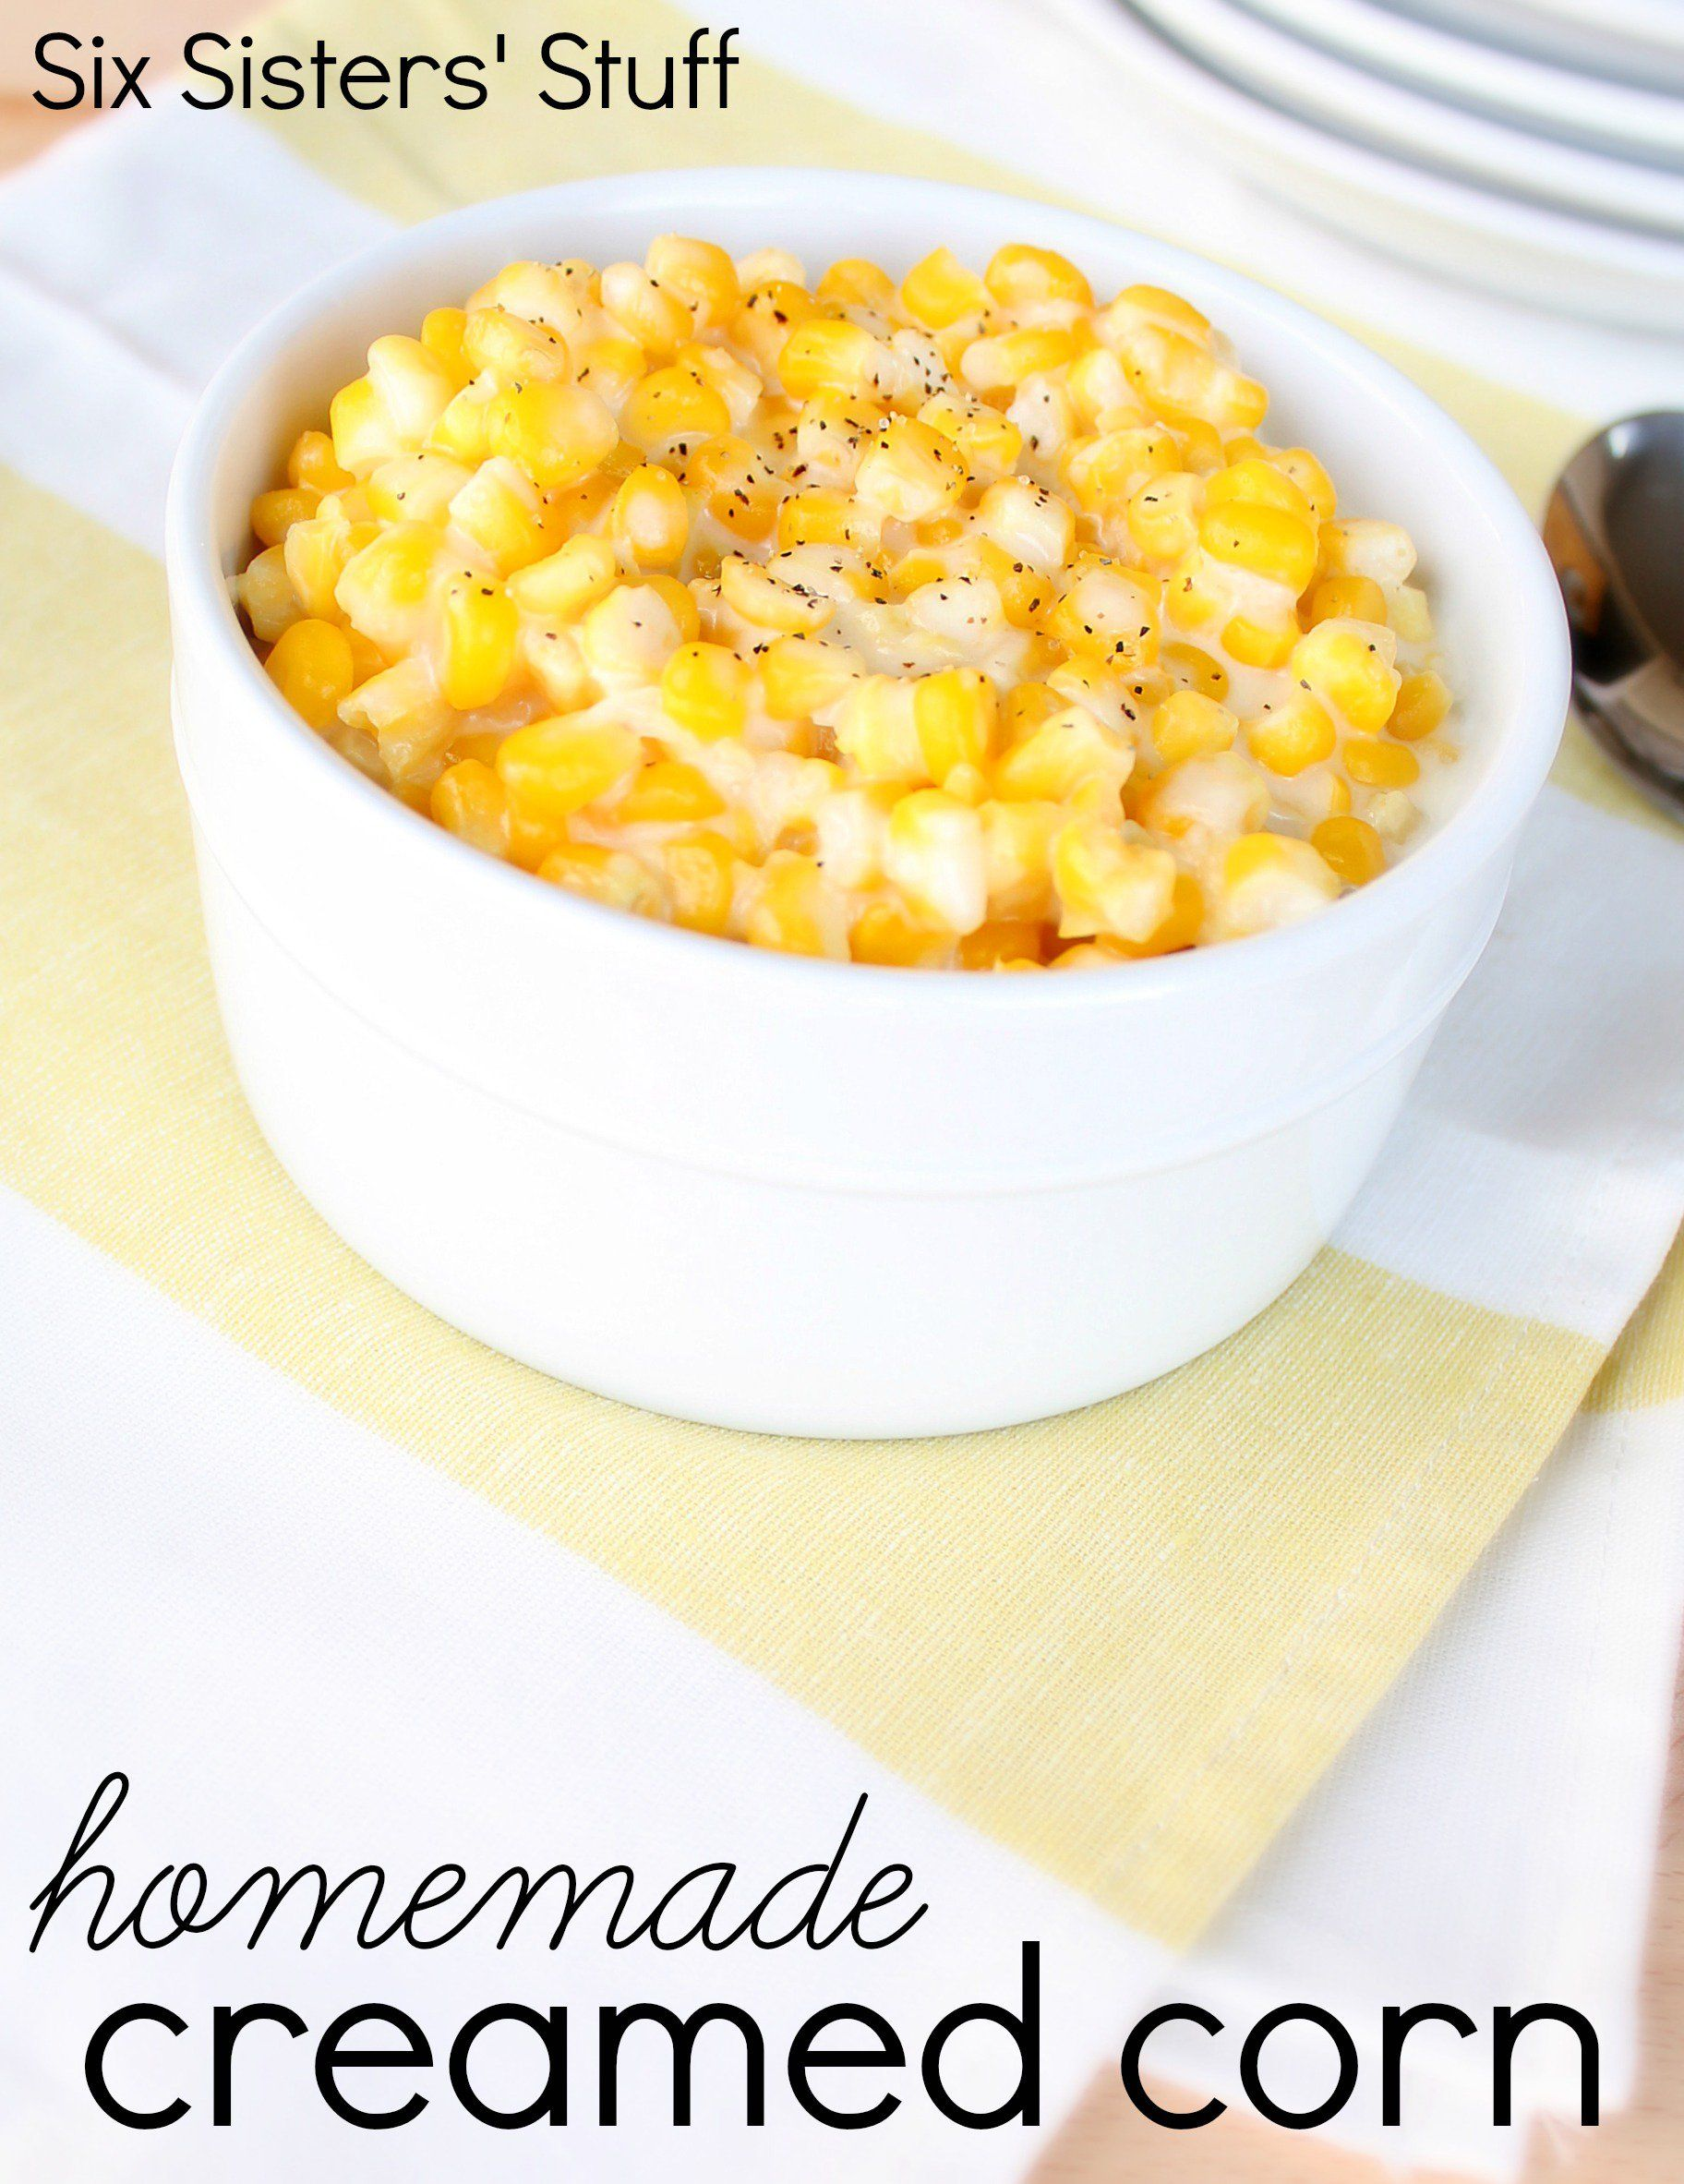 Homemade Creamed Corn Recipe